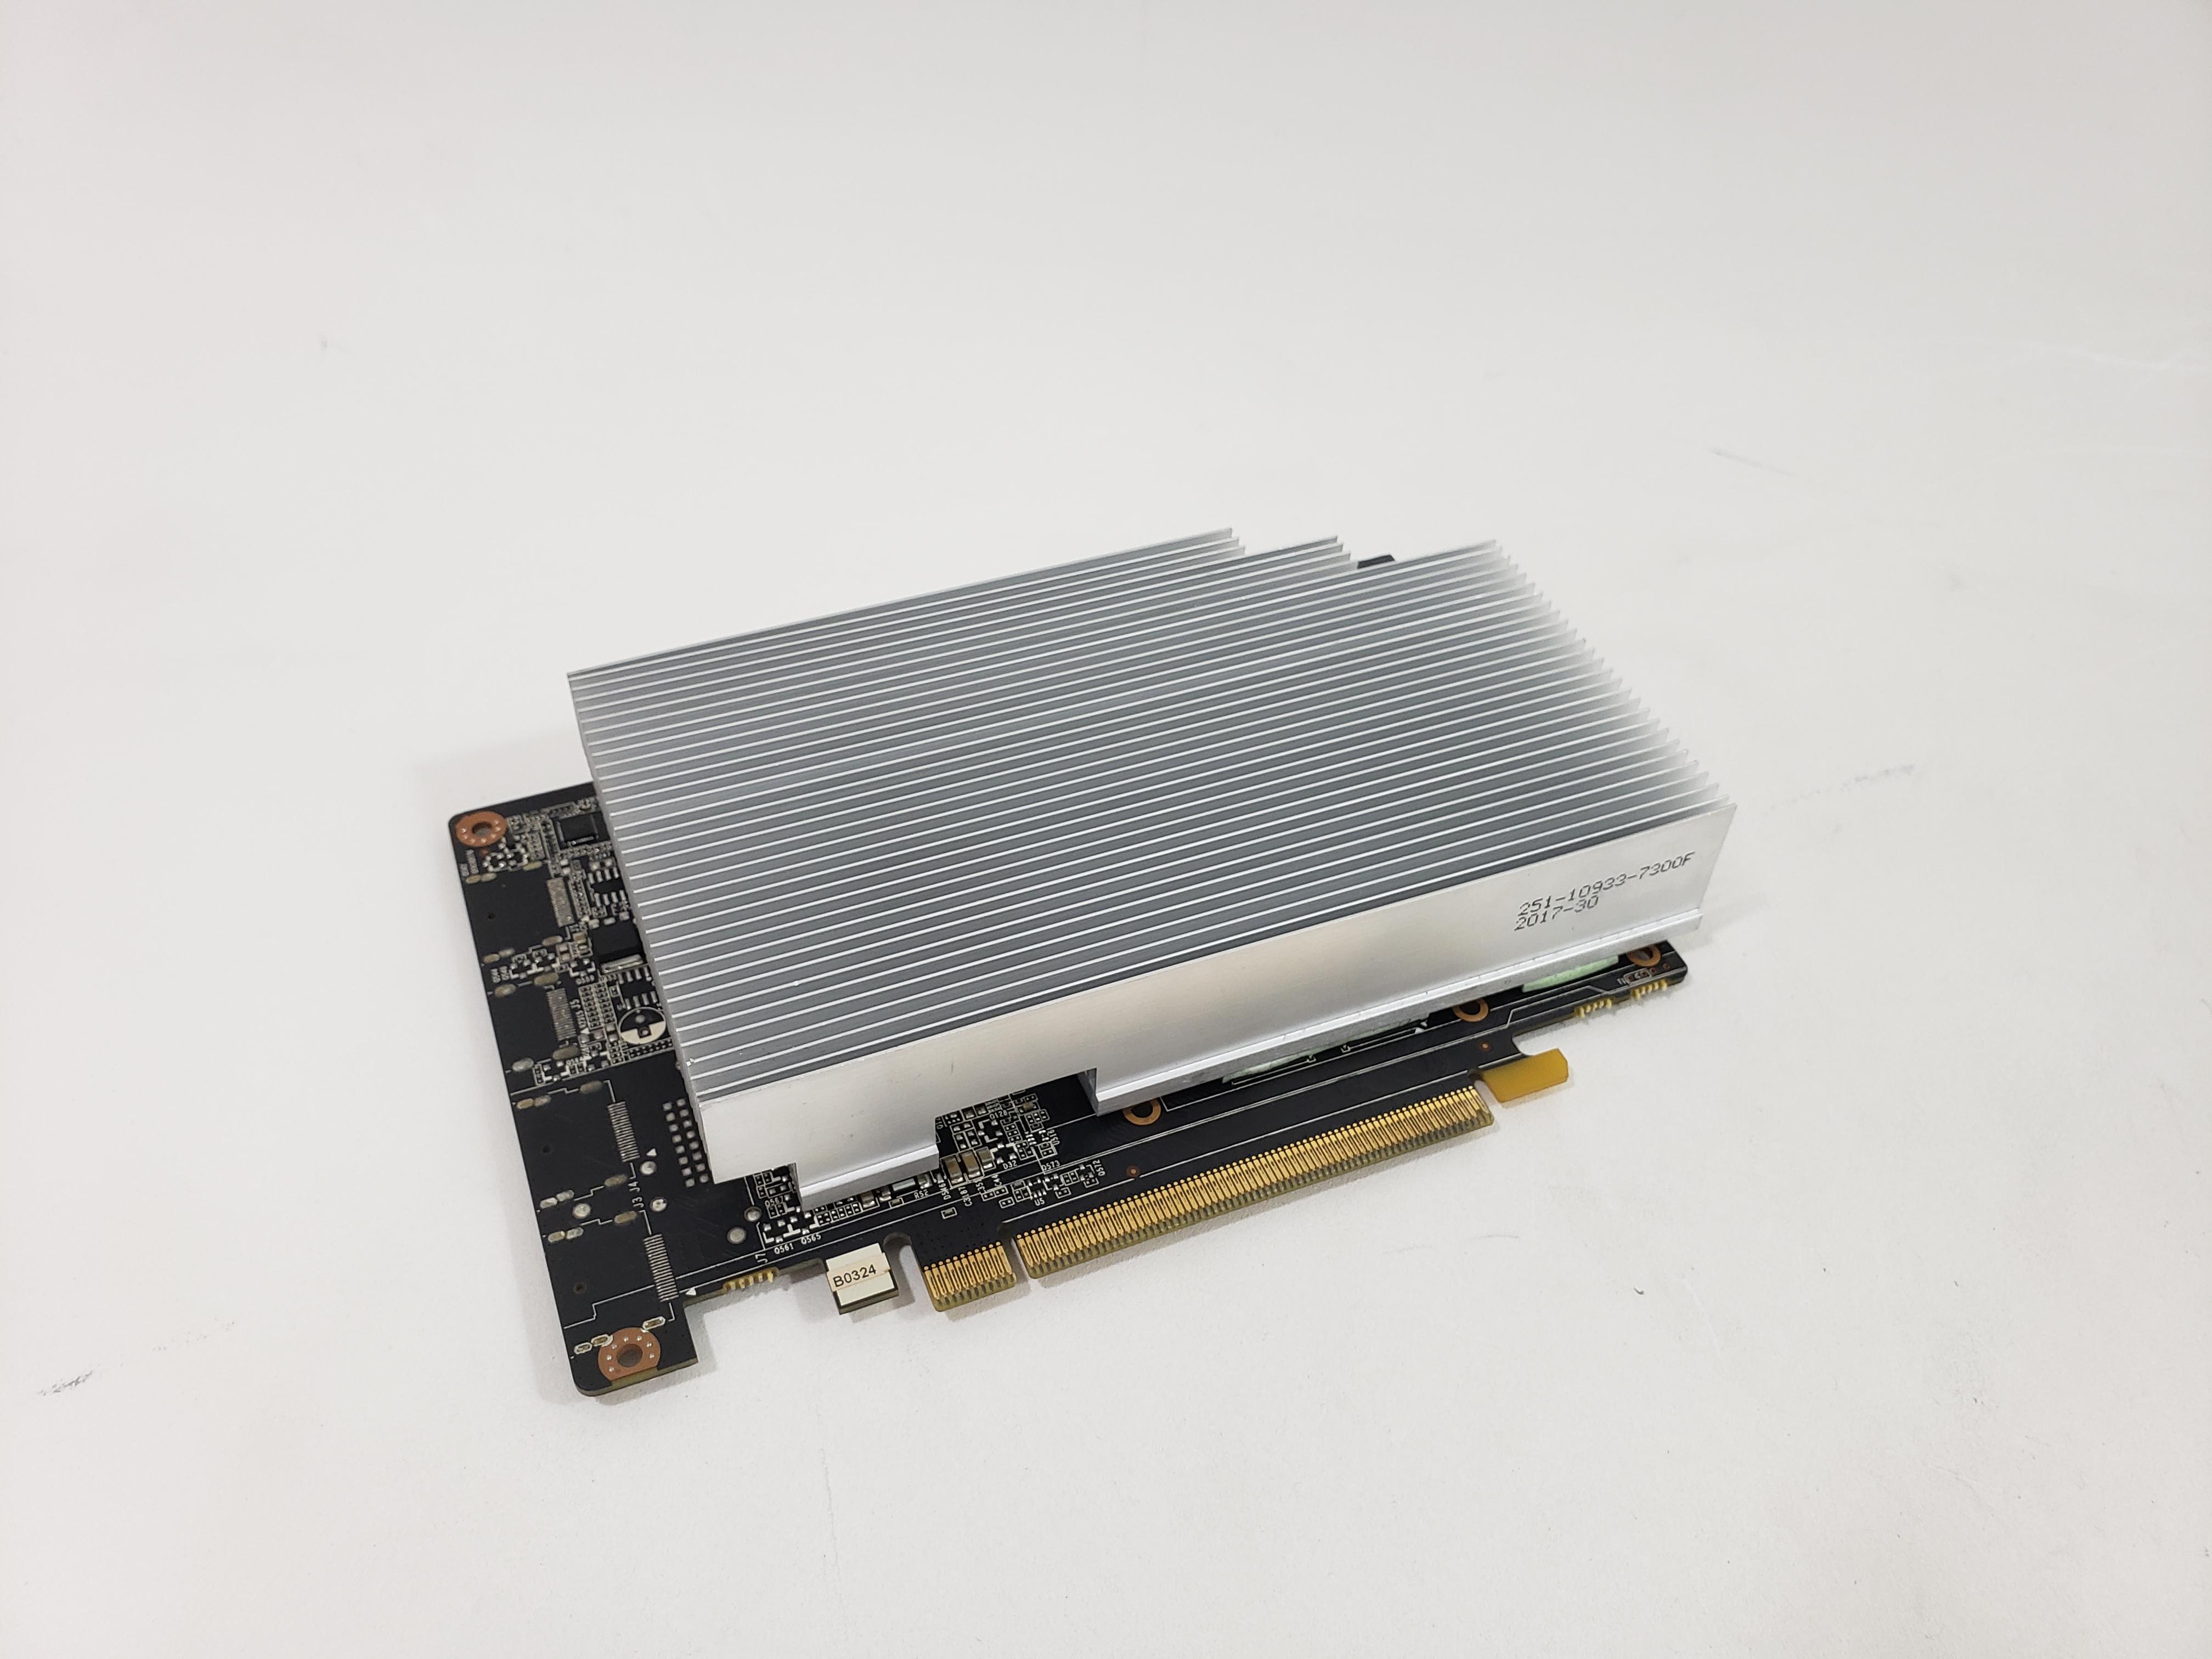 Details about Zotac Mining P106-100 6GB GDDR5 ZT-M10600C-10B Video Graphics  Card GPU